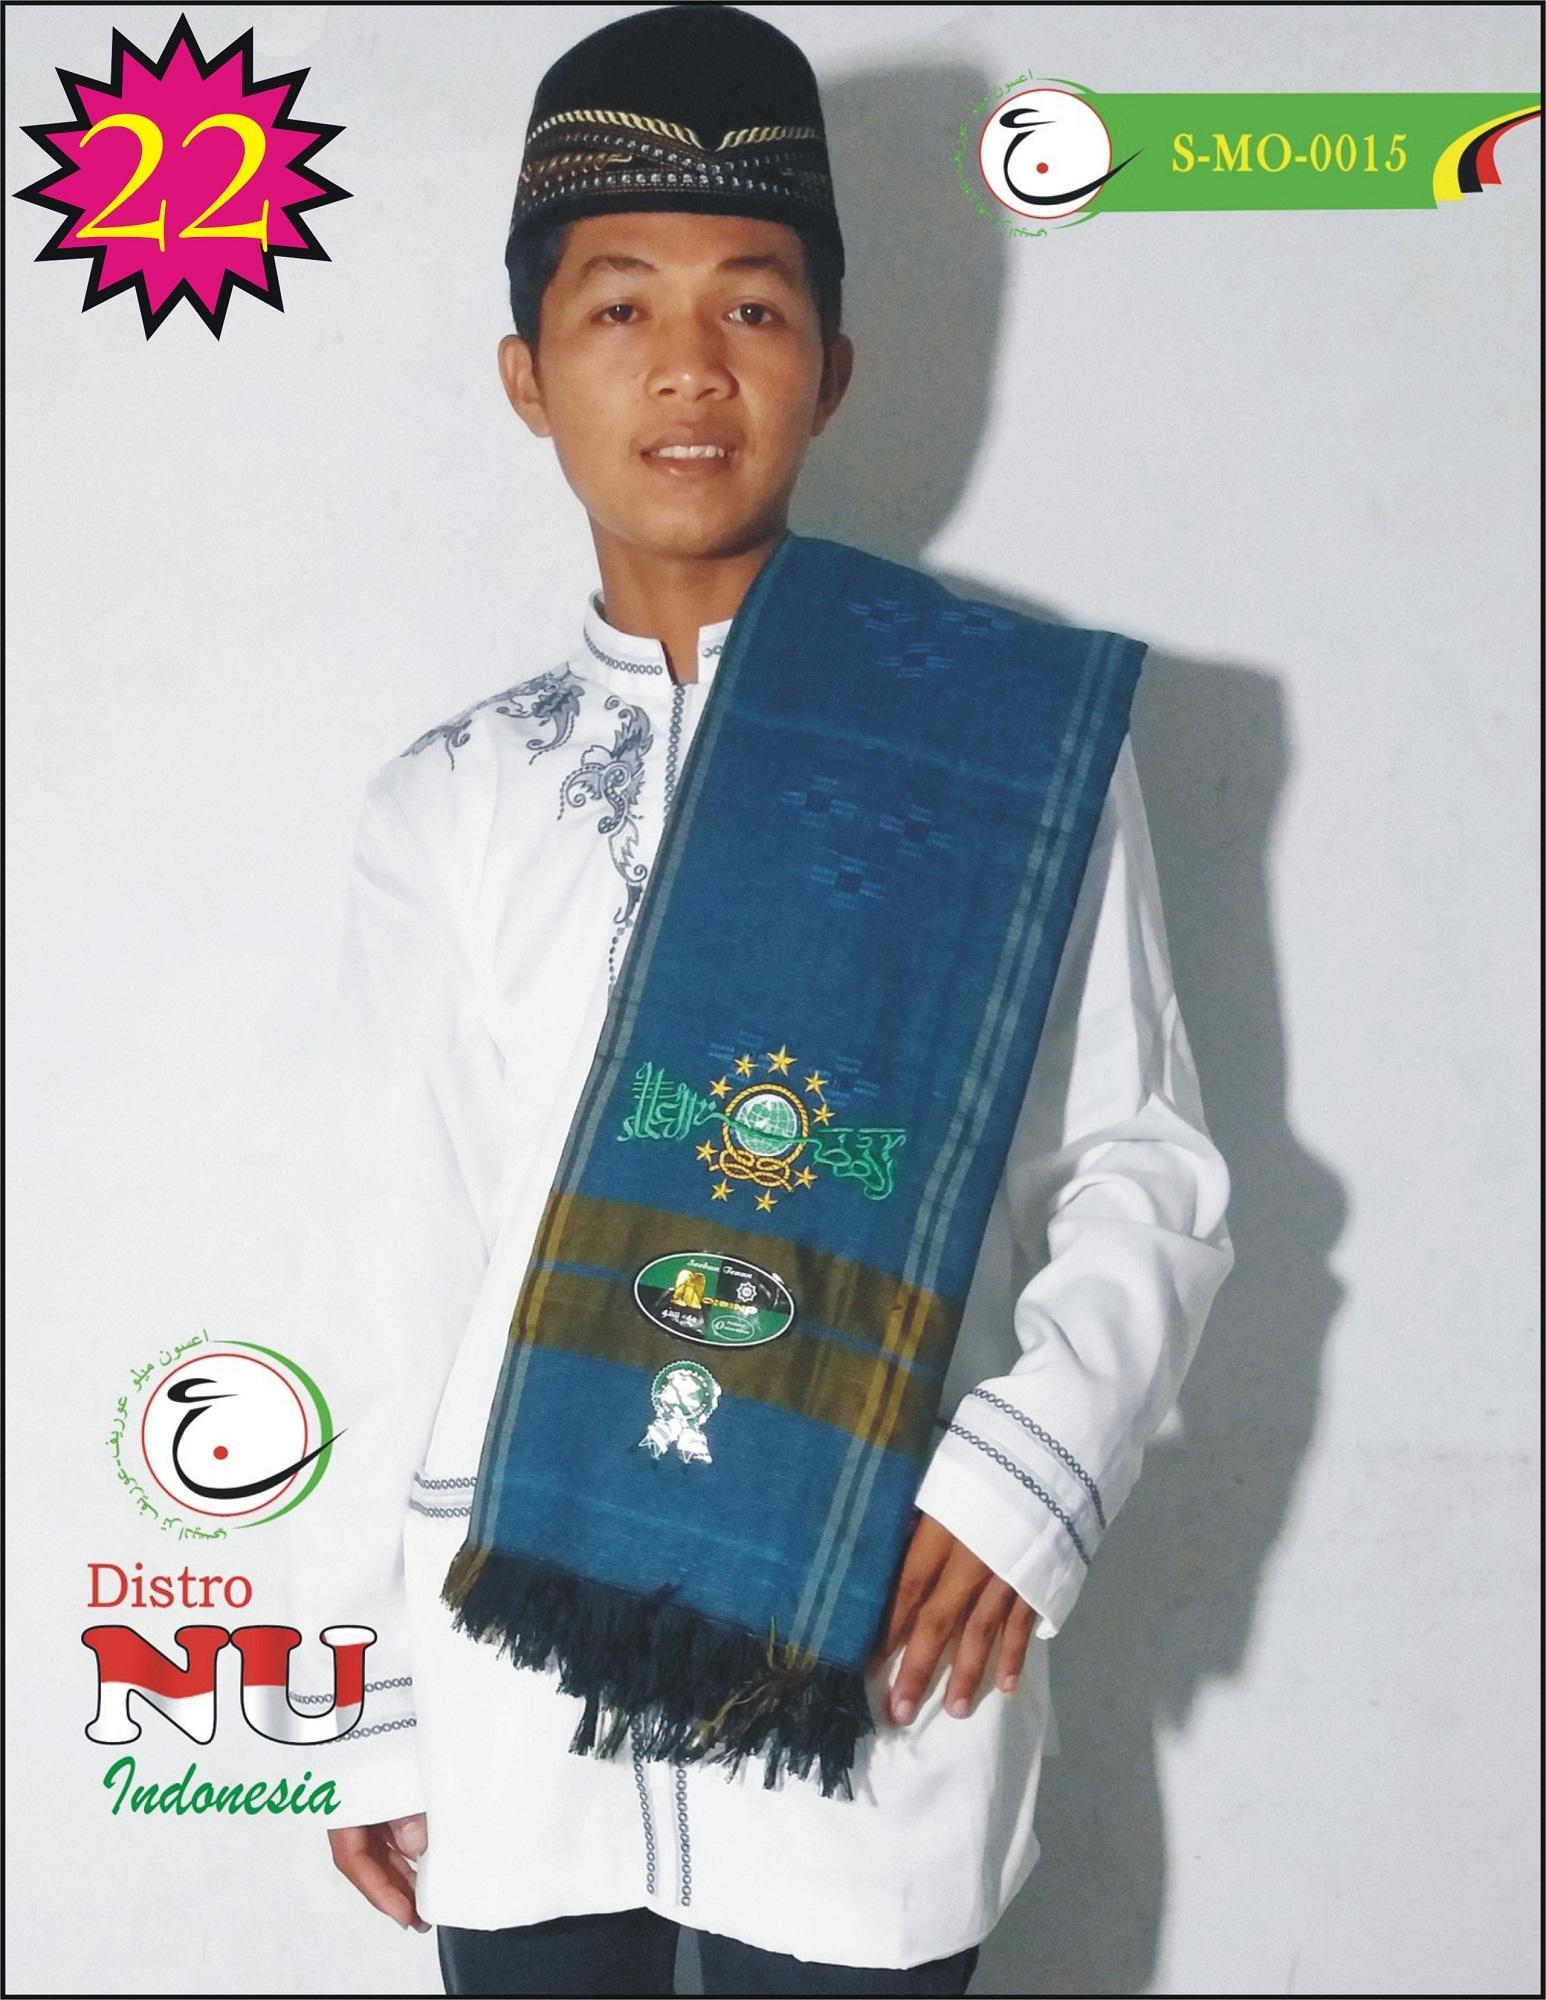 SORBAN NU XL BORDIR TEBAL BAGUS TENUN MO BIRU  / surban / sajadah / sarung / batik nu / jasko / koko / busana muslim / peci / songkok / gamis / jubah / sarung nu / jas nu / jasket / kerudung baru / baju wanita / kemeja / kaos distro / kaos lukis / kopri